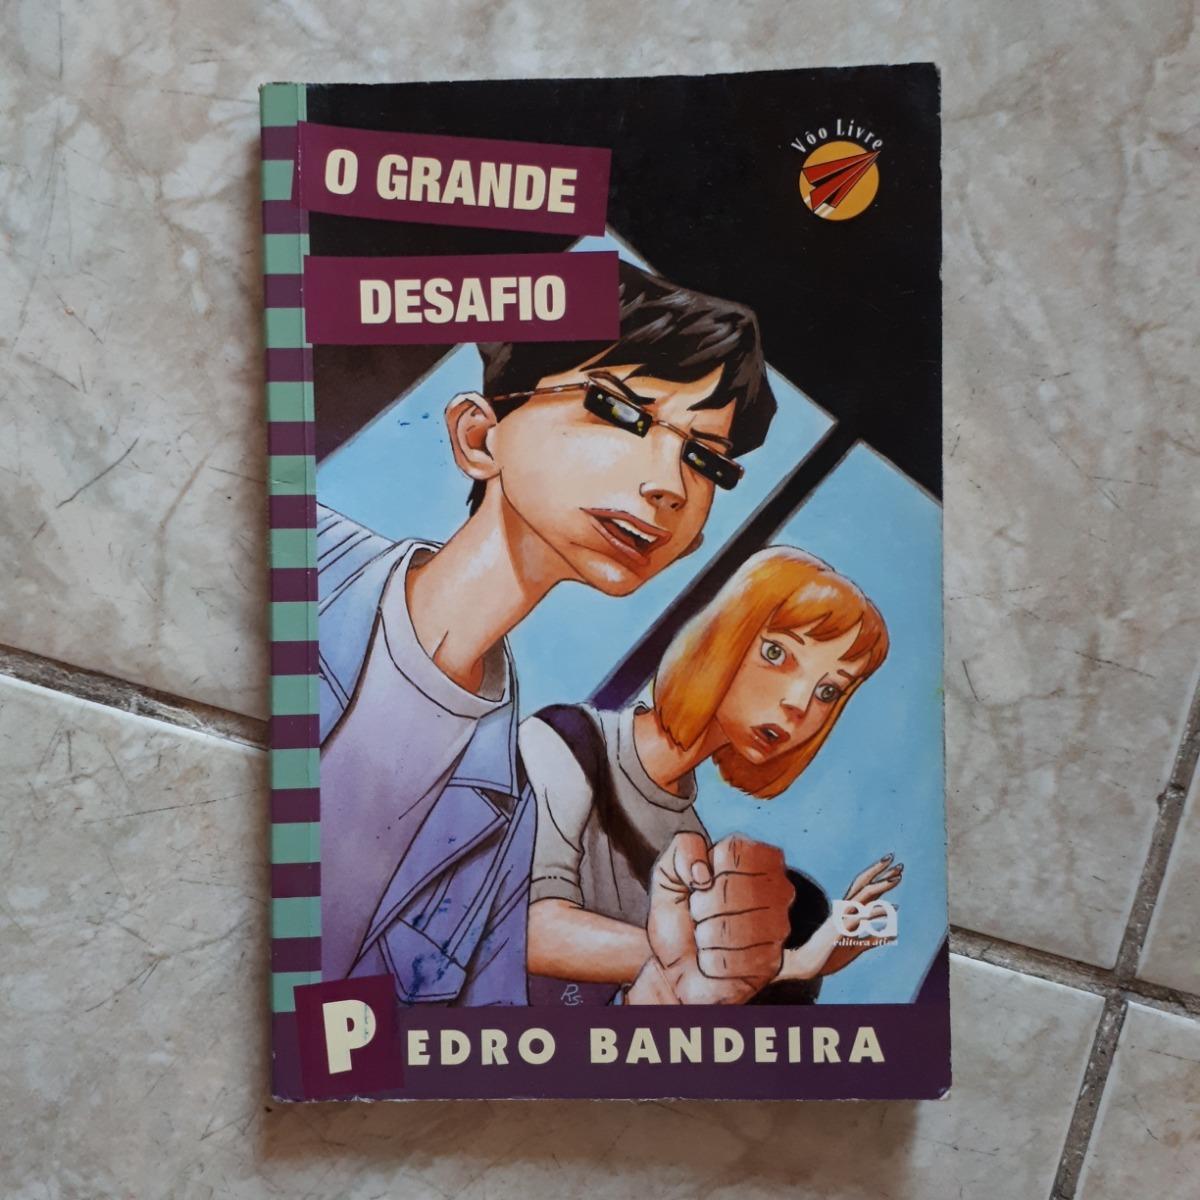 O GRANDE DESAFIO PEDRO BANDEIRA EPUB DOWNLOAD